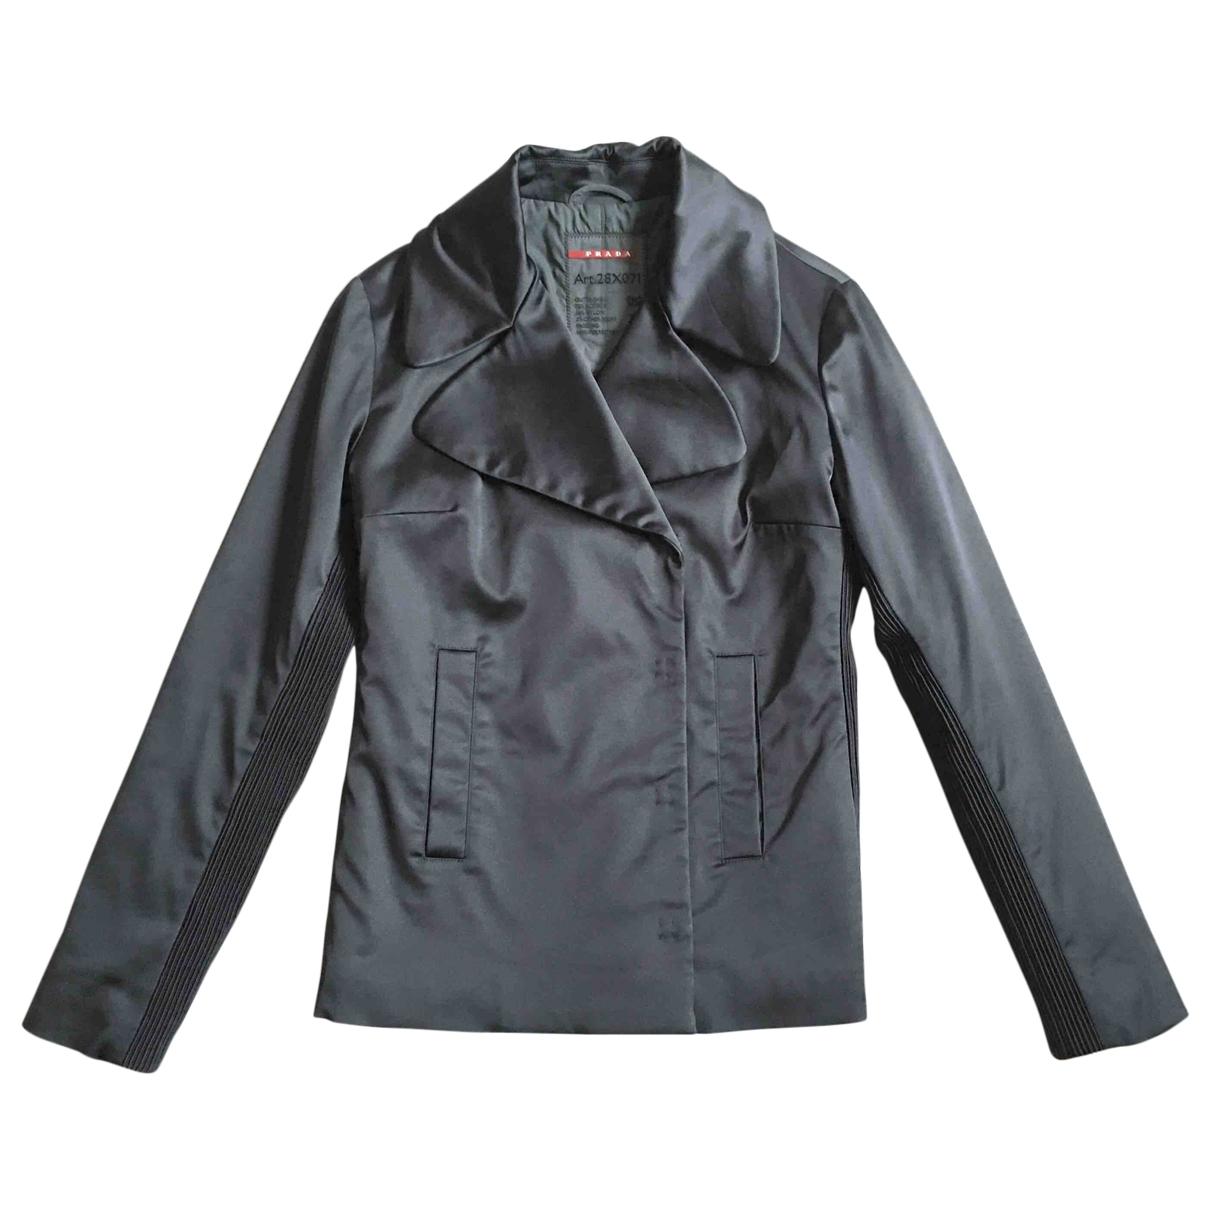 Prada \N jacket for Women 42 IT